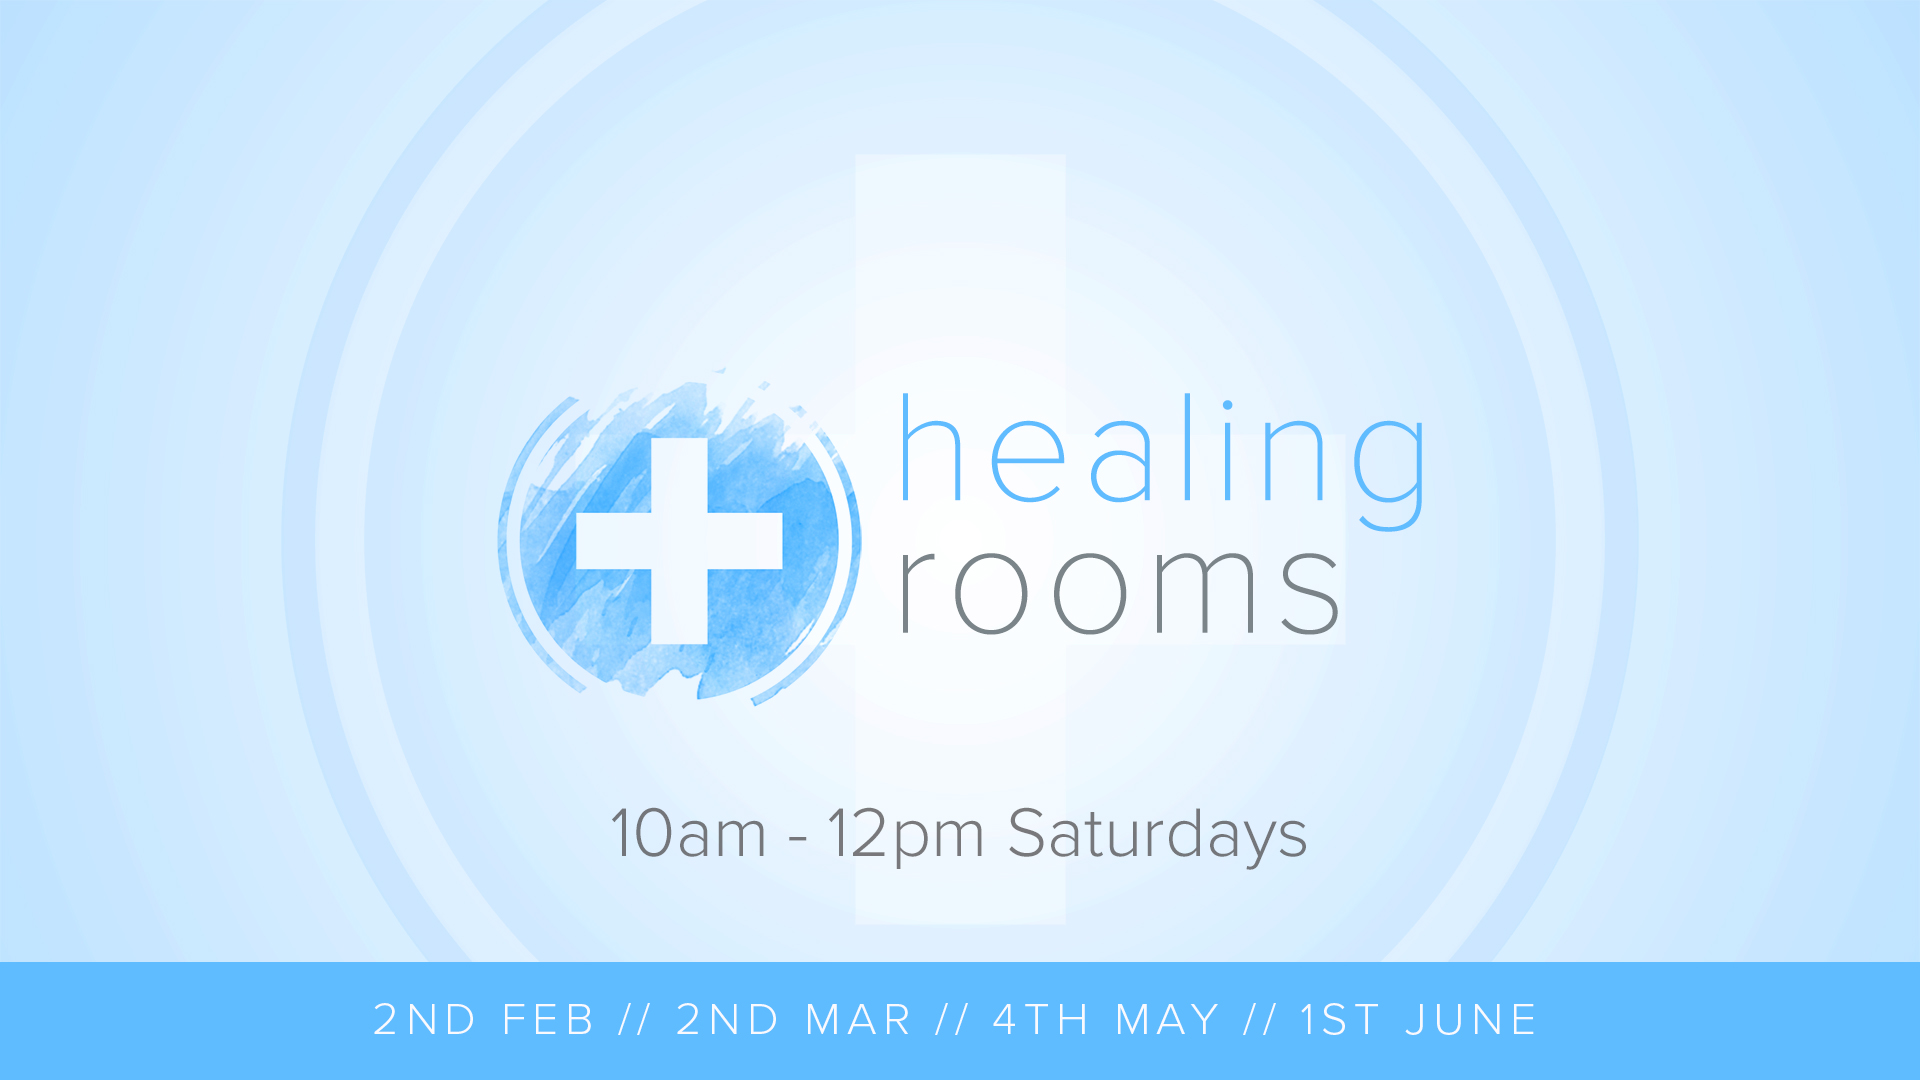 healing-rooms-1920x1080-Feb.JPG